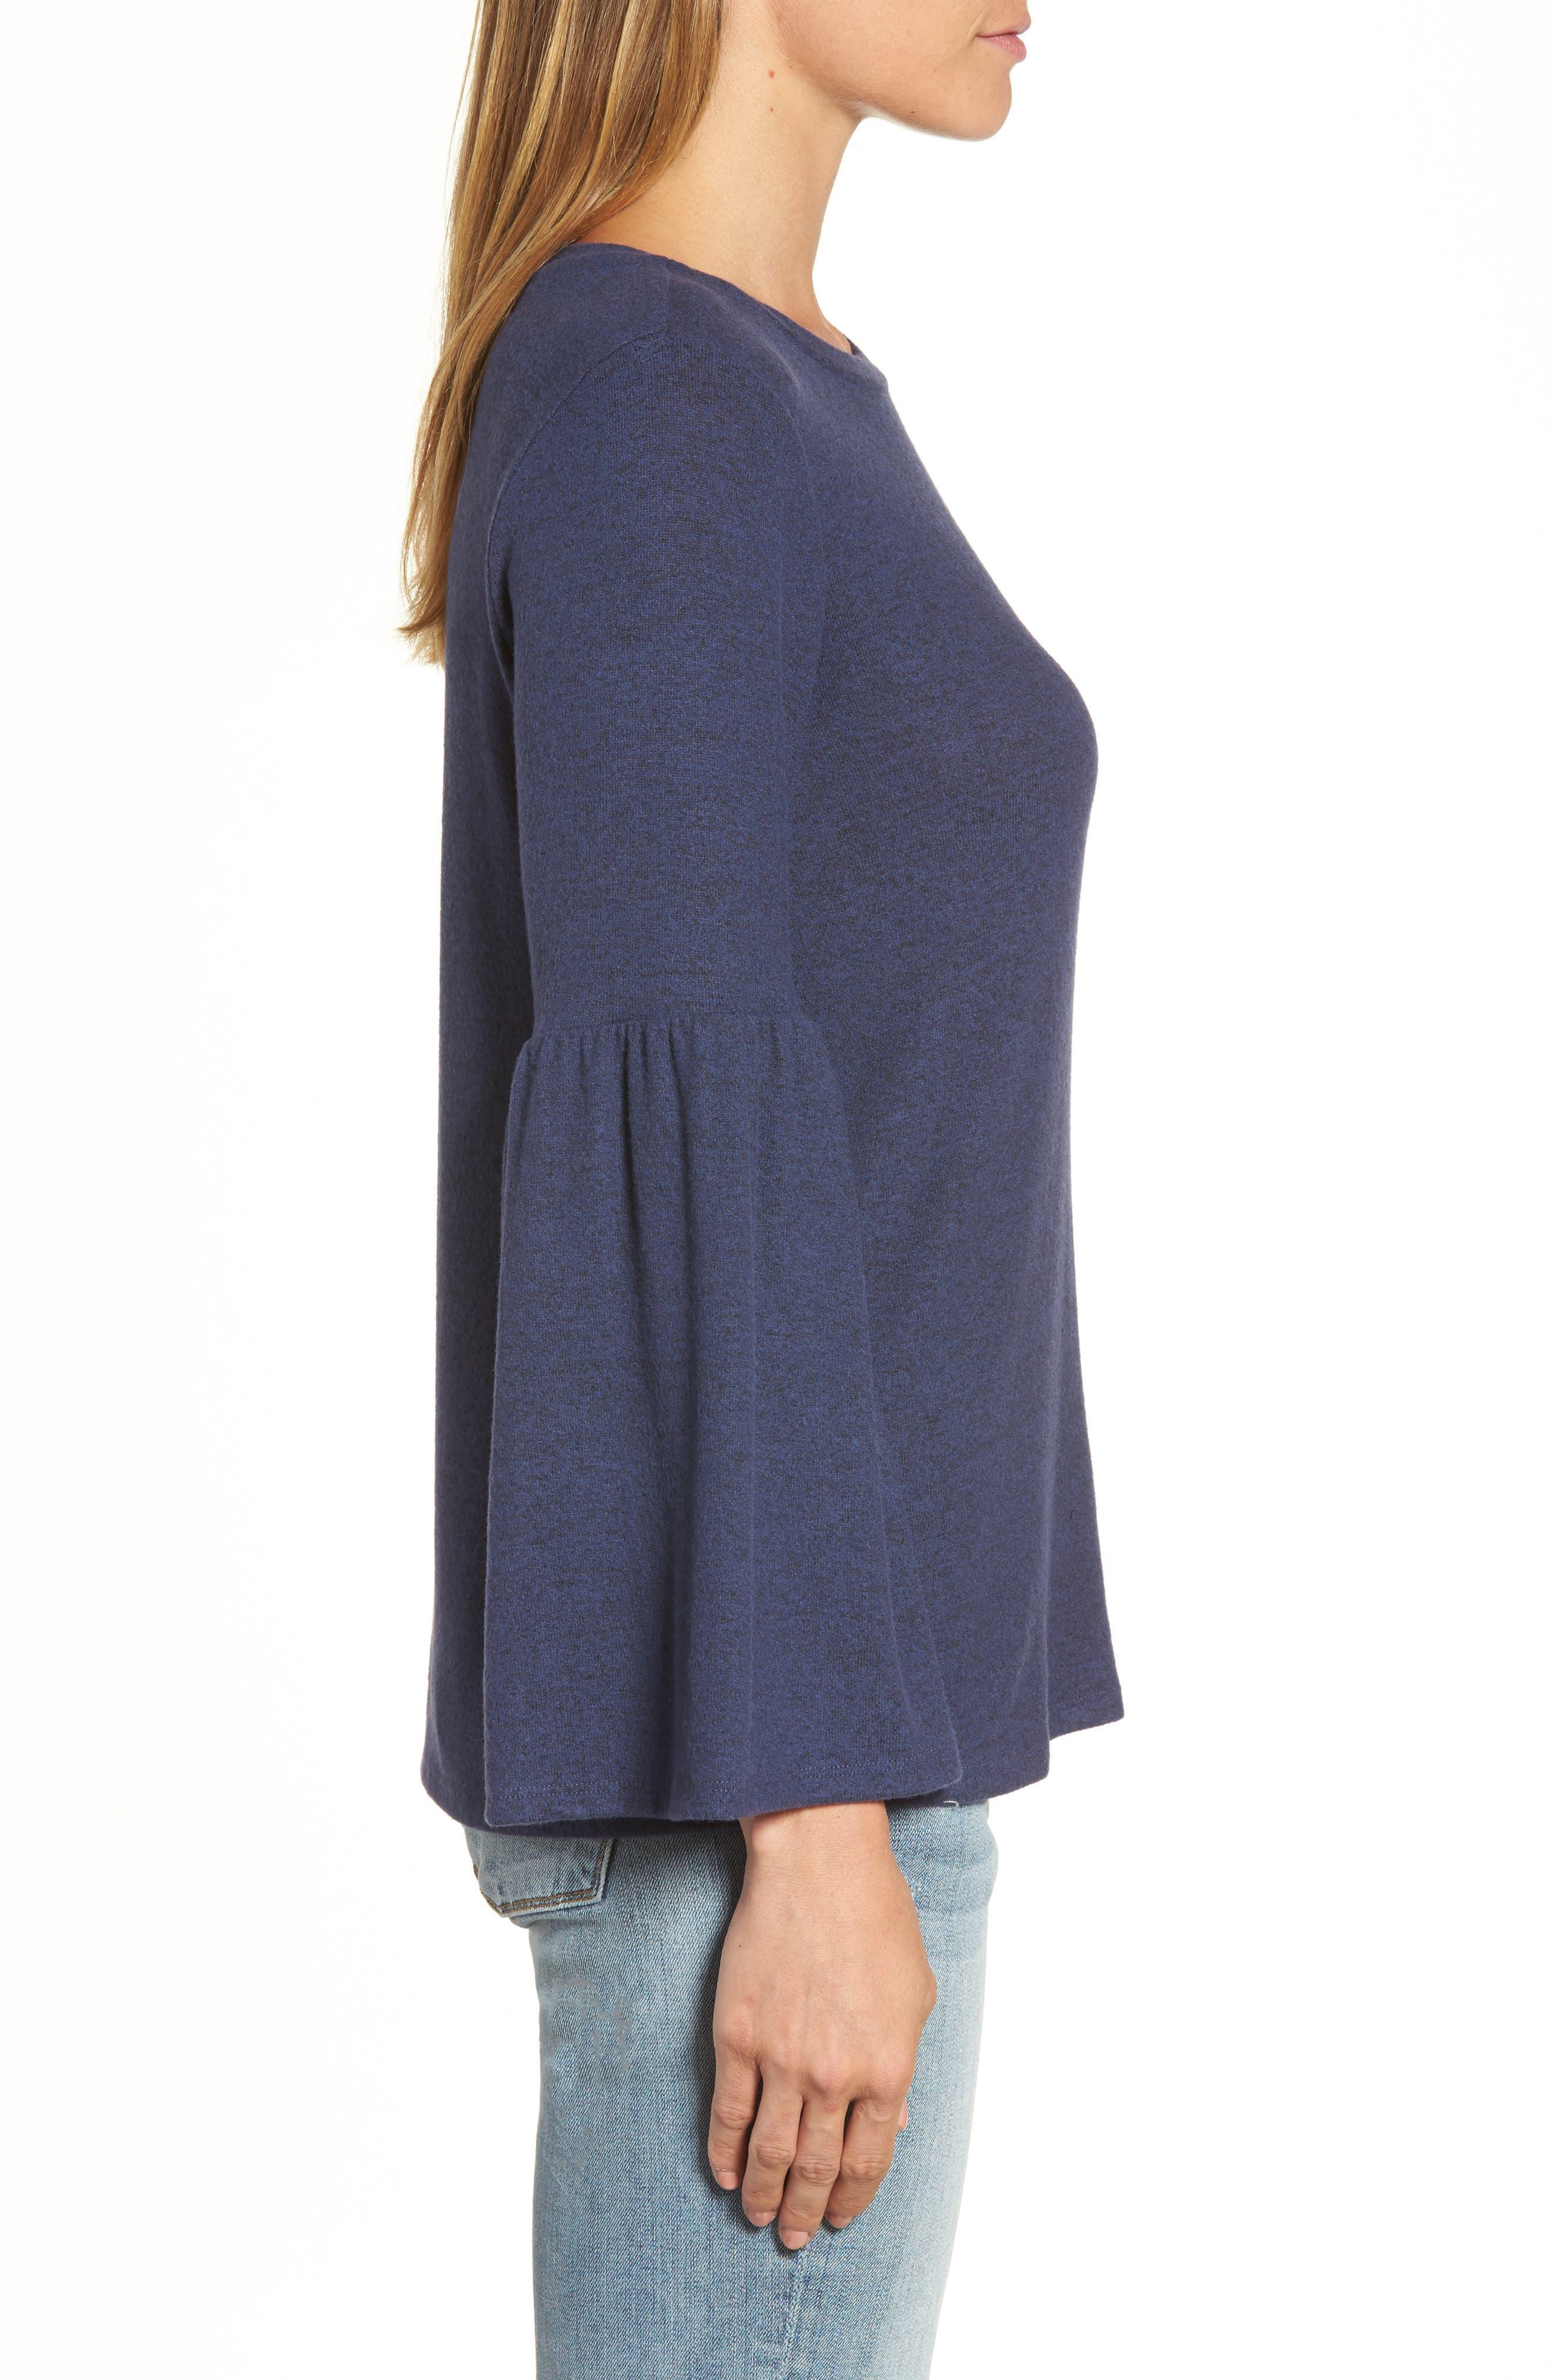 GIBSON,                             Bell Sleeve Cozy Fleece Pullover,                             Alternate thumbnail 3, color,                             415